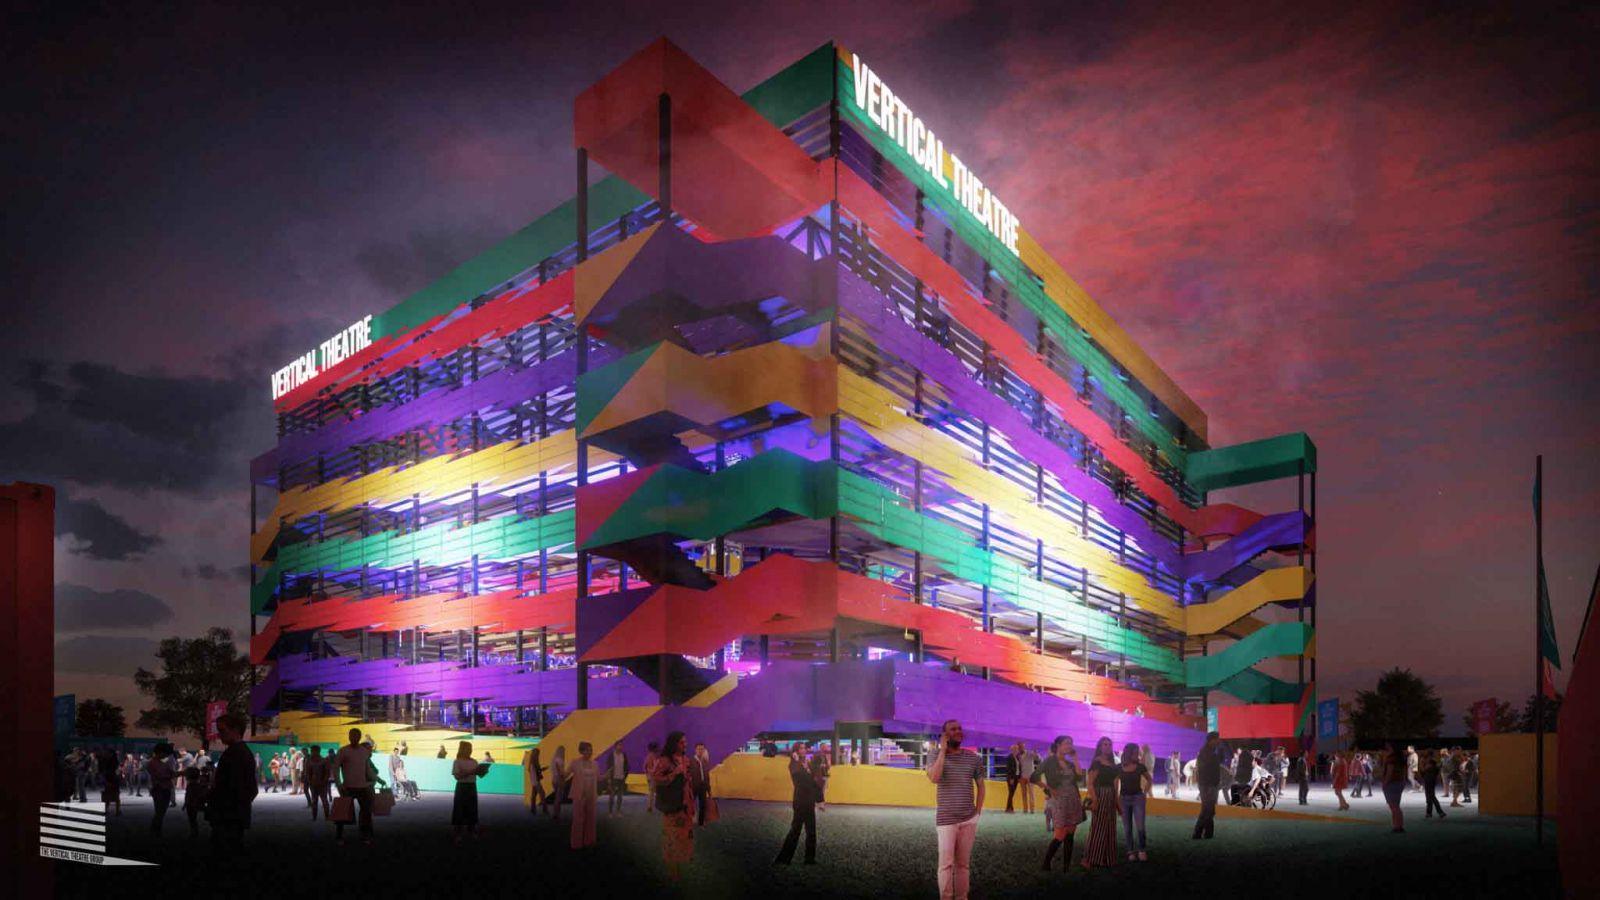 Vertical Theatre: Ένας πολυχώρος τέχνης στη νέα εποχή της κοινωνικής απόστασης